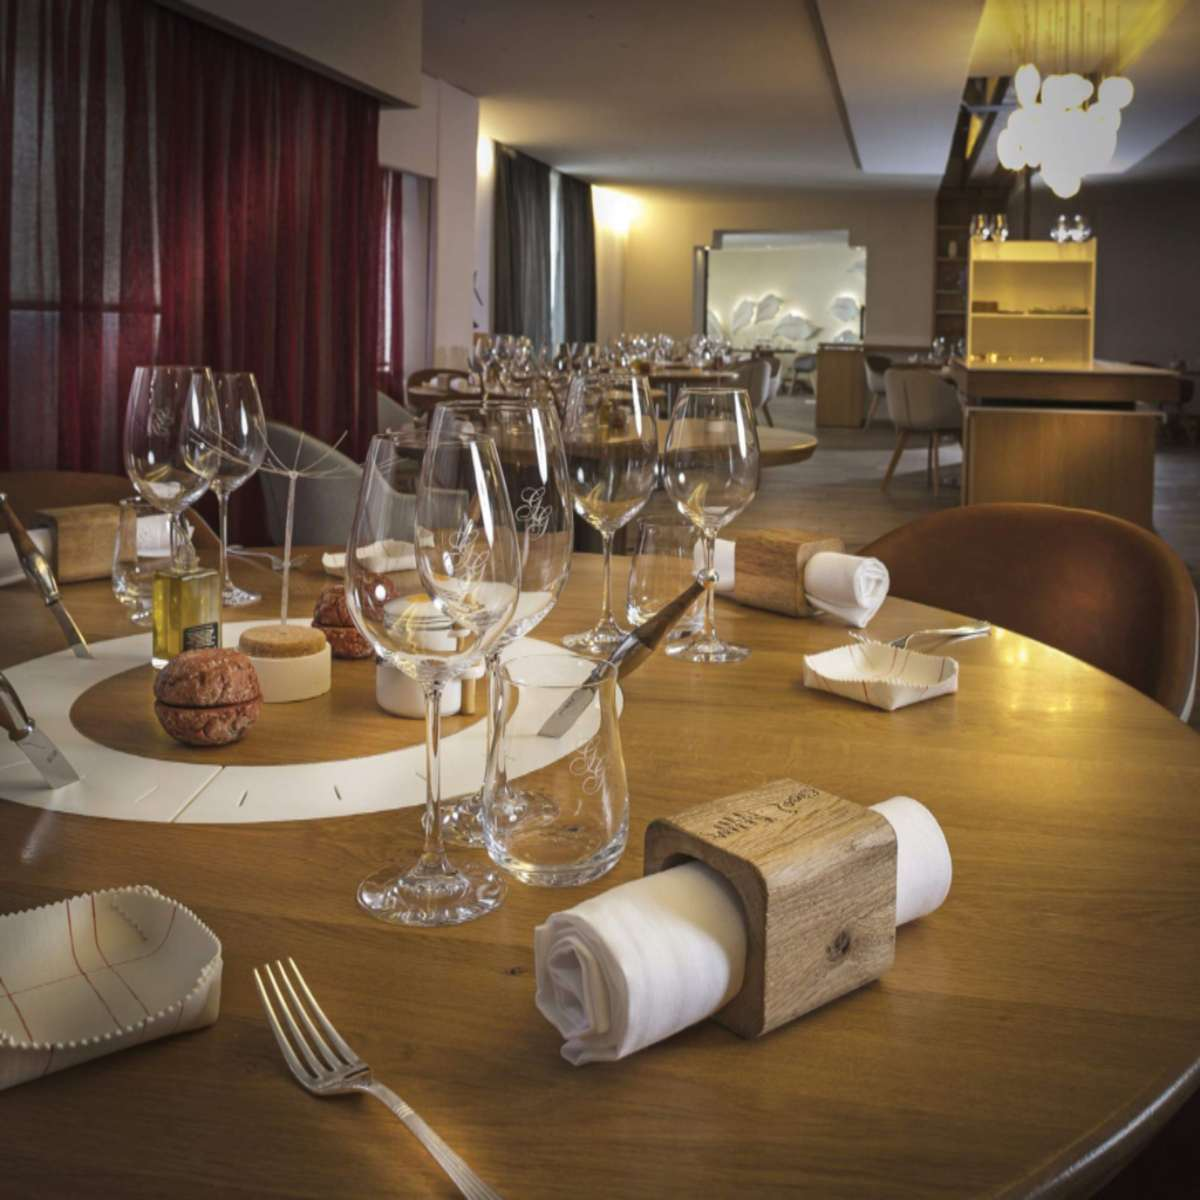 Auberge du Vieux Puits καλύτερο εστιατόριο 2020 εσωτερική άποψη